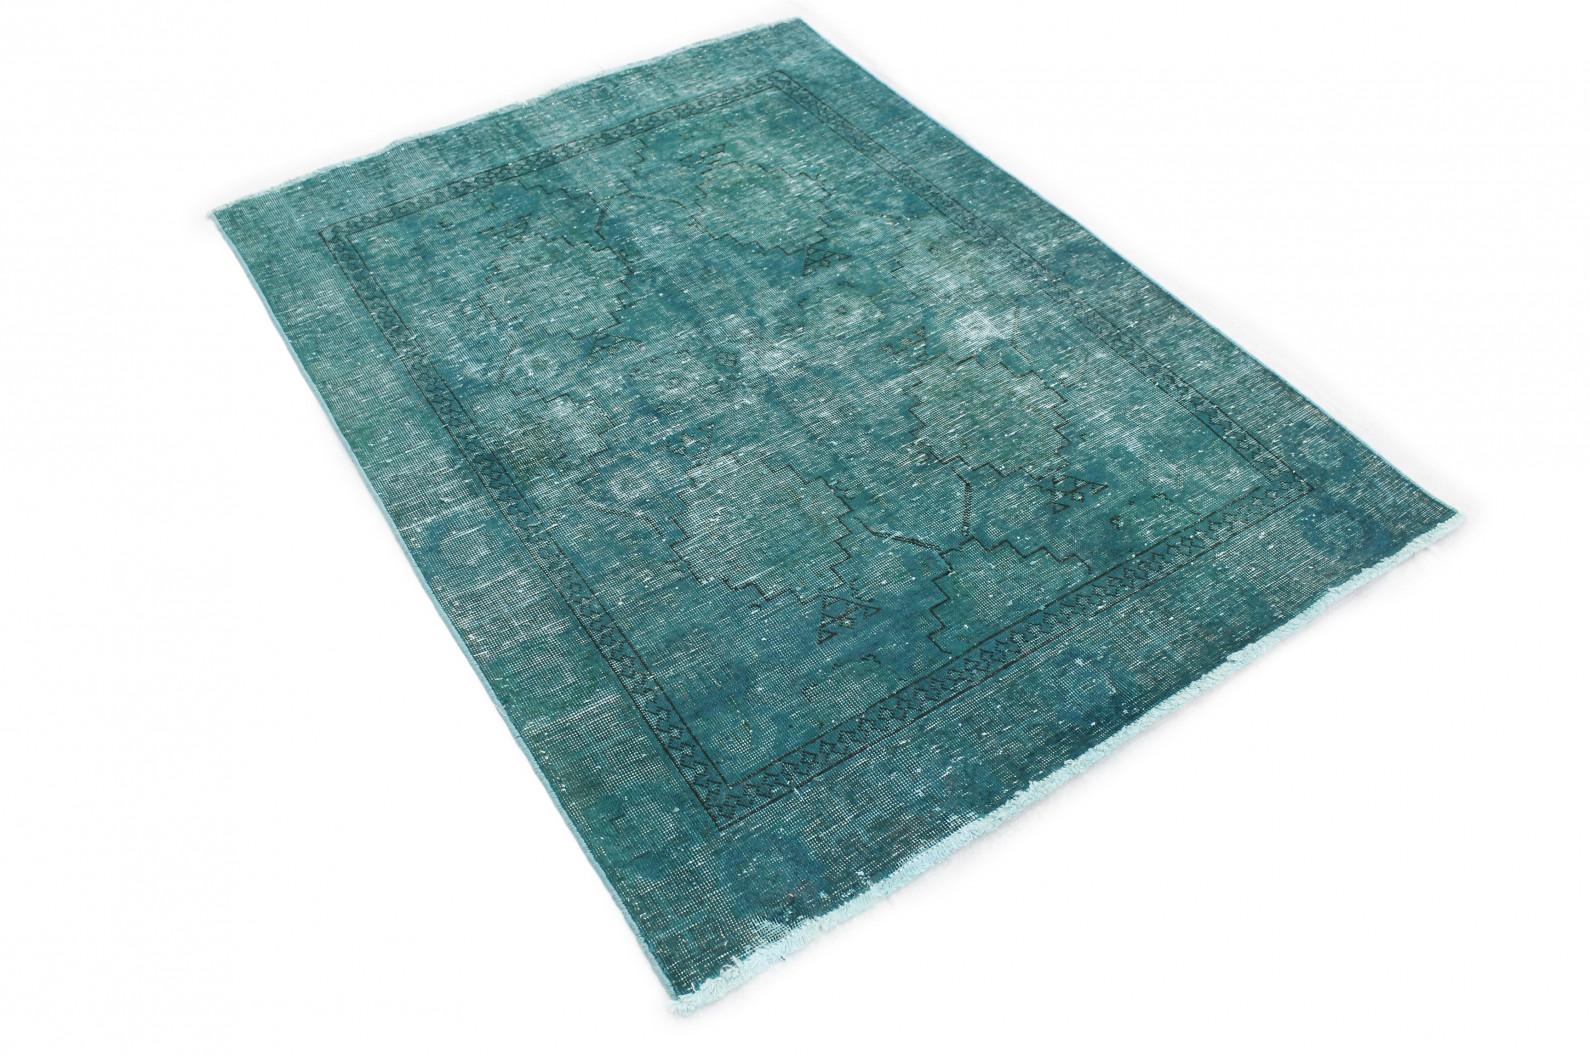 vintage teppich gr n in 180x130 1001 177269 bei kaufen. Black Bedroom Furniture Sets. Home Design Ideas